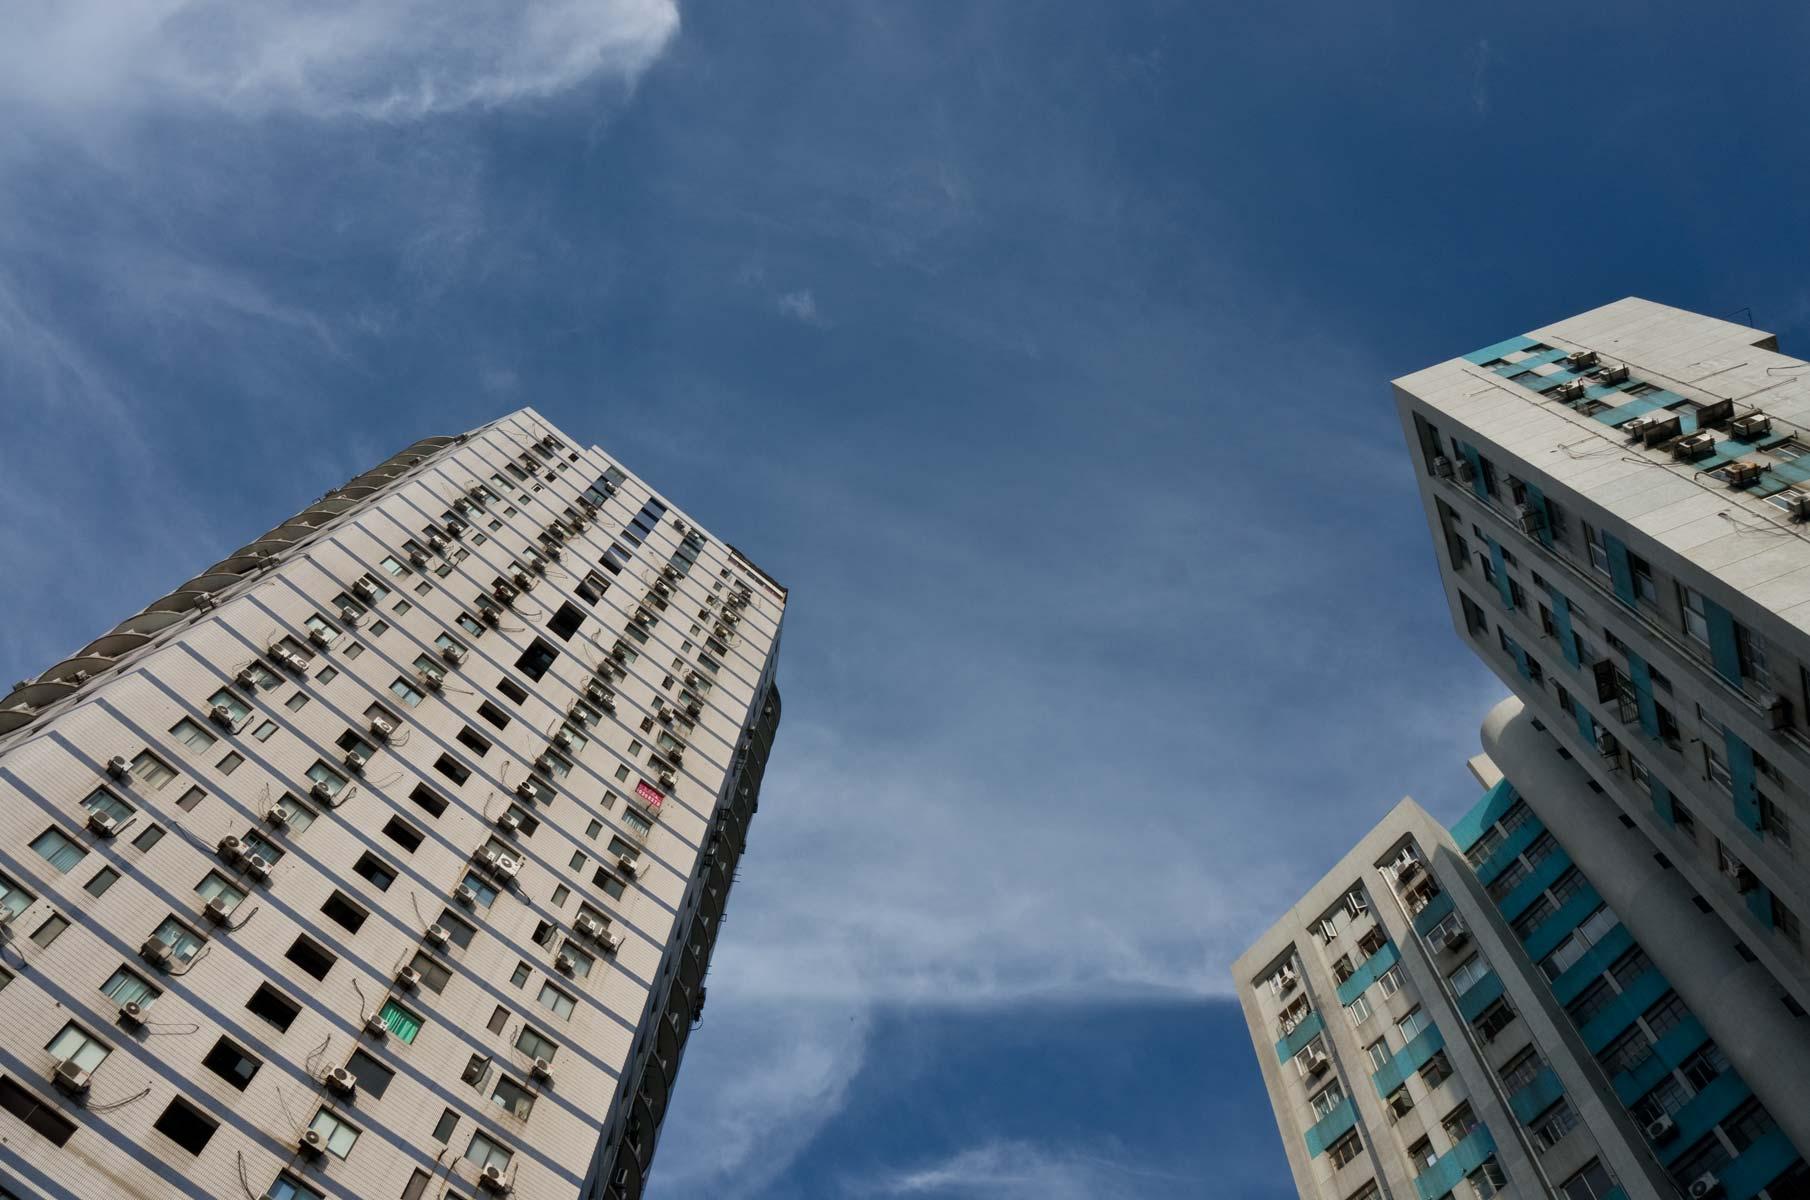 Pudong Hochhäuser am Tag mit blauem Himmel in Shanghai, China